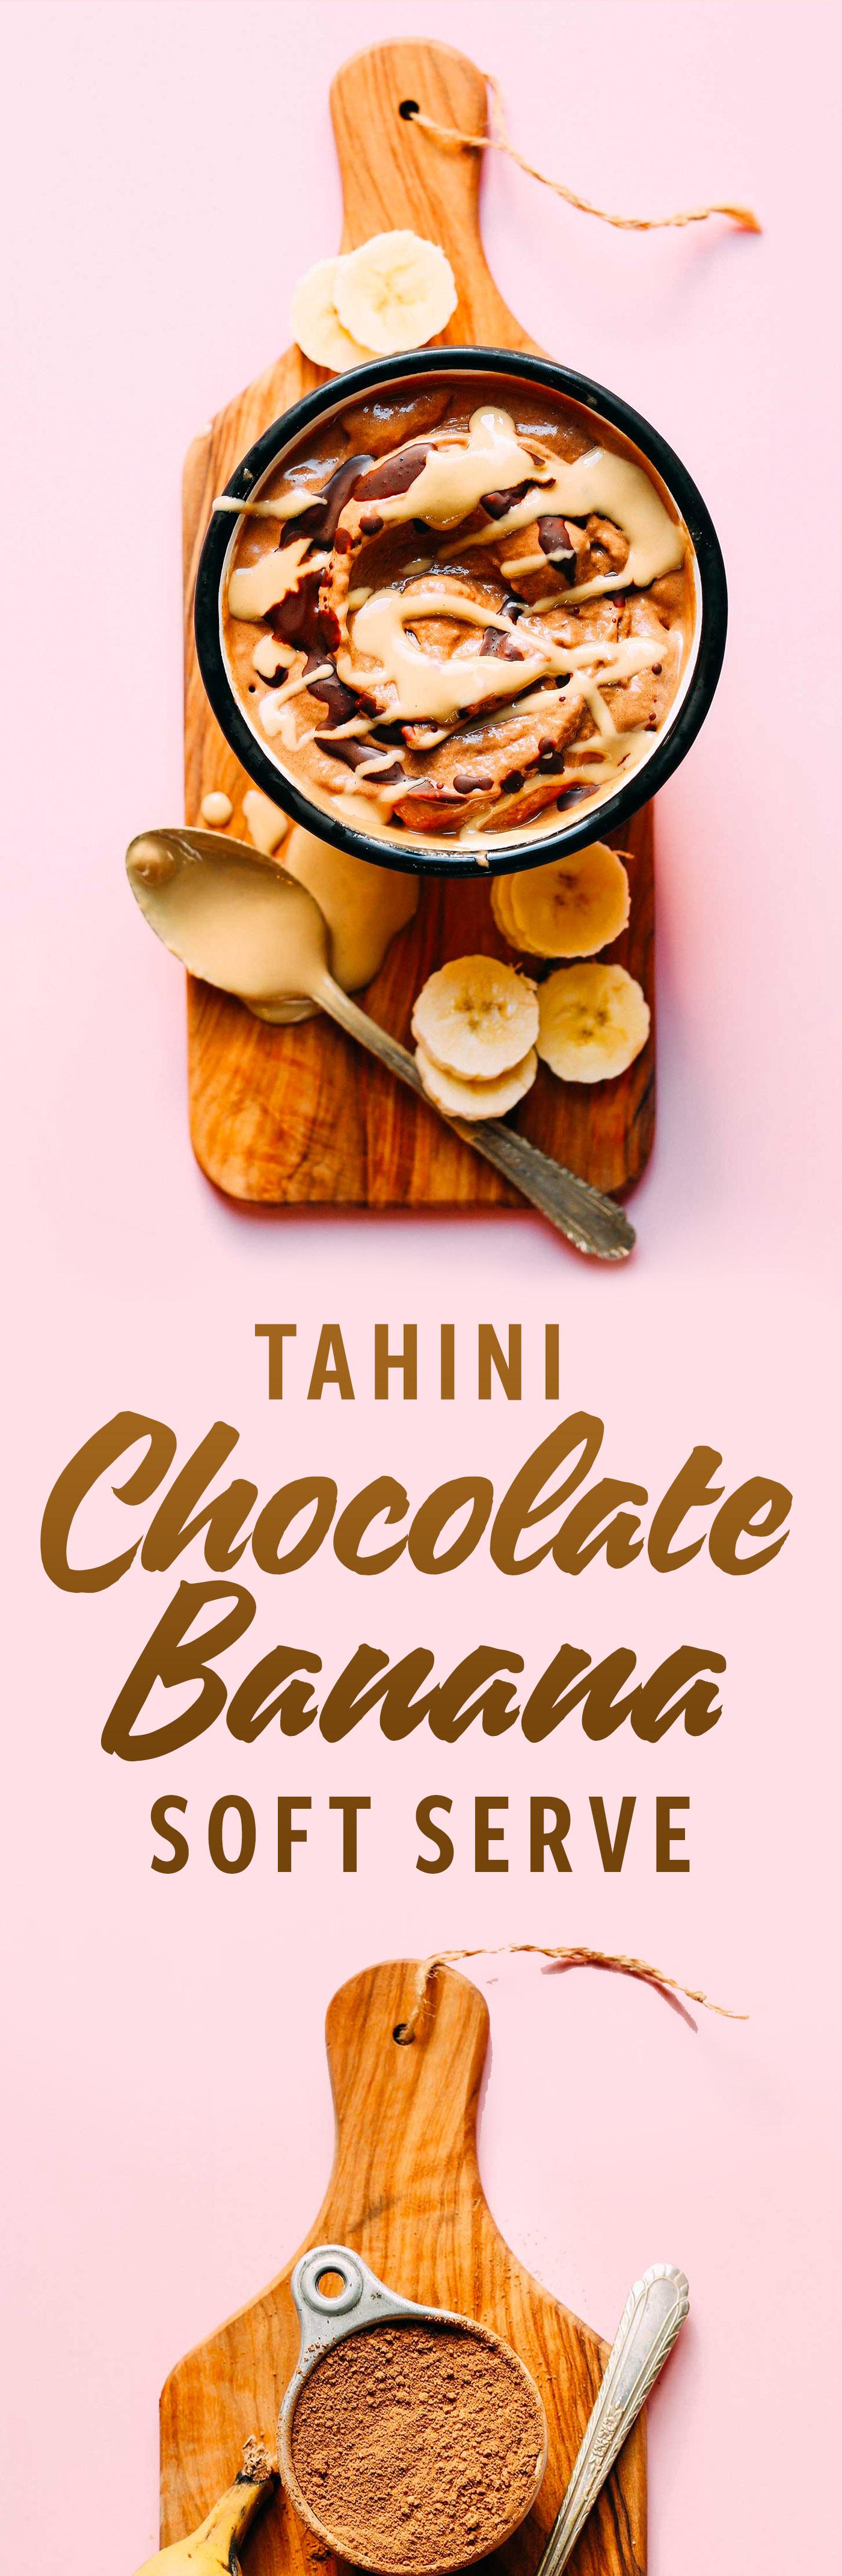 HEALTHY Chocolate Tahini Banana Soft Serve! 4 ingredients, naturally sweet, SO delicious! #vegan #softserve #banana #icecream #glutenfree #chocolate #tahini #minimalistbaker